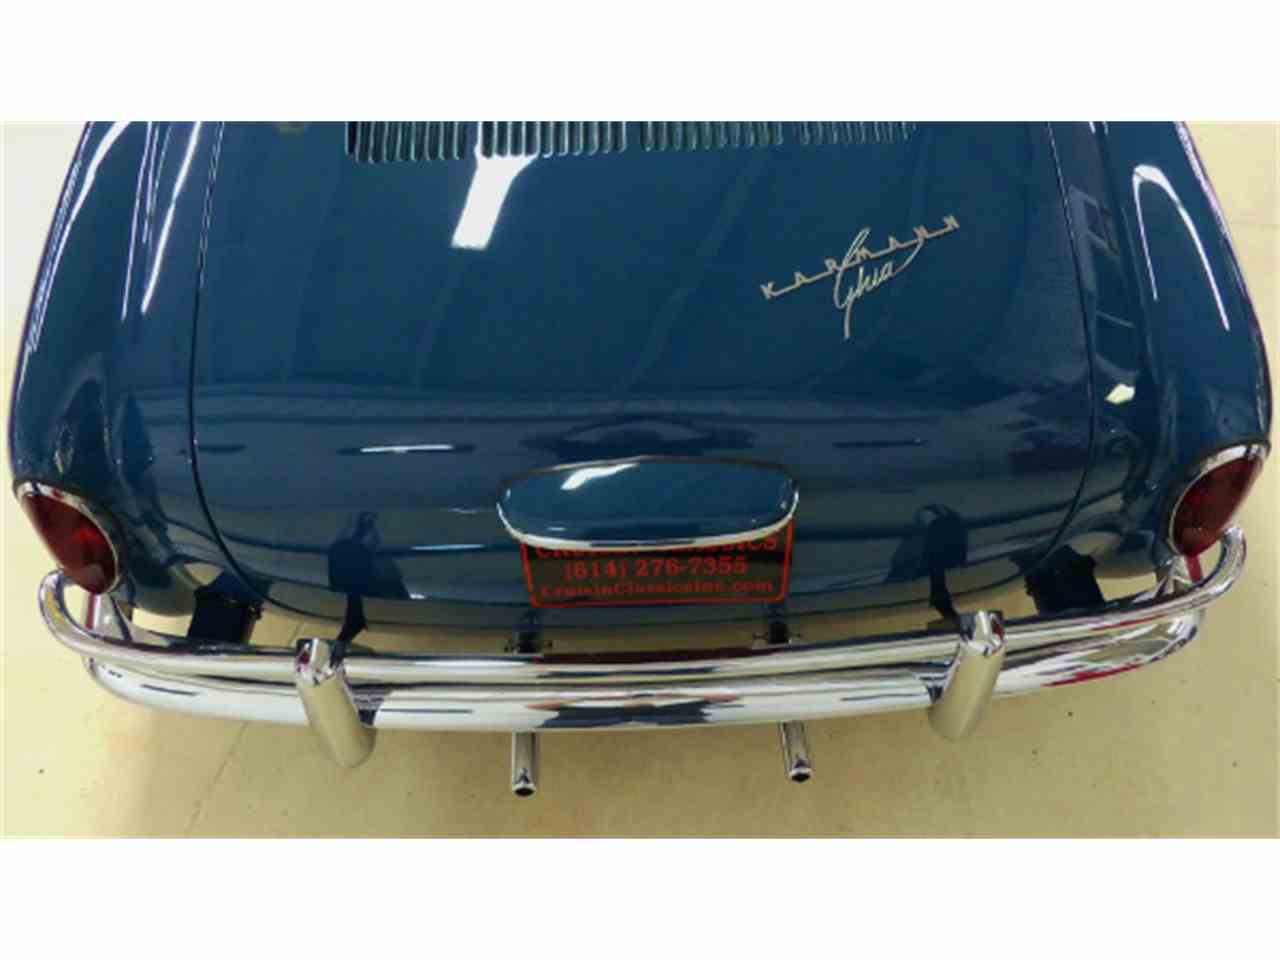 1966 Volkswagen Karmann Ghia For Sale Classiccars Com